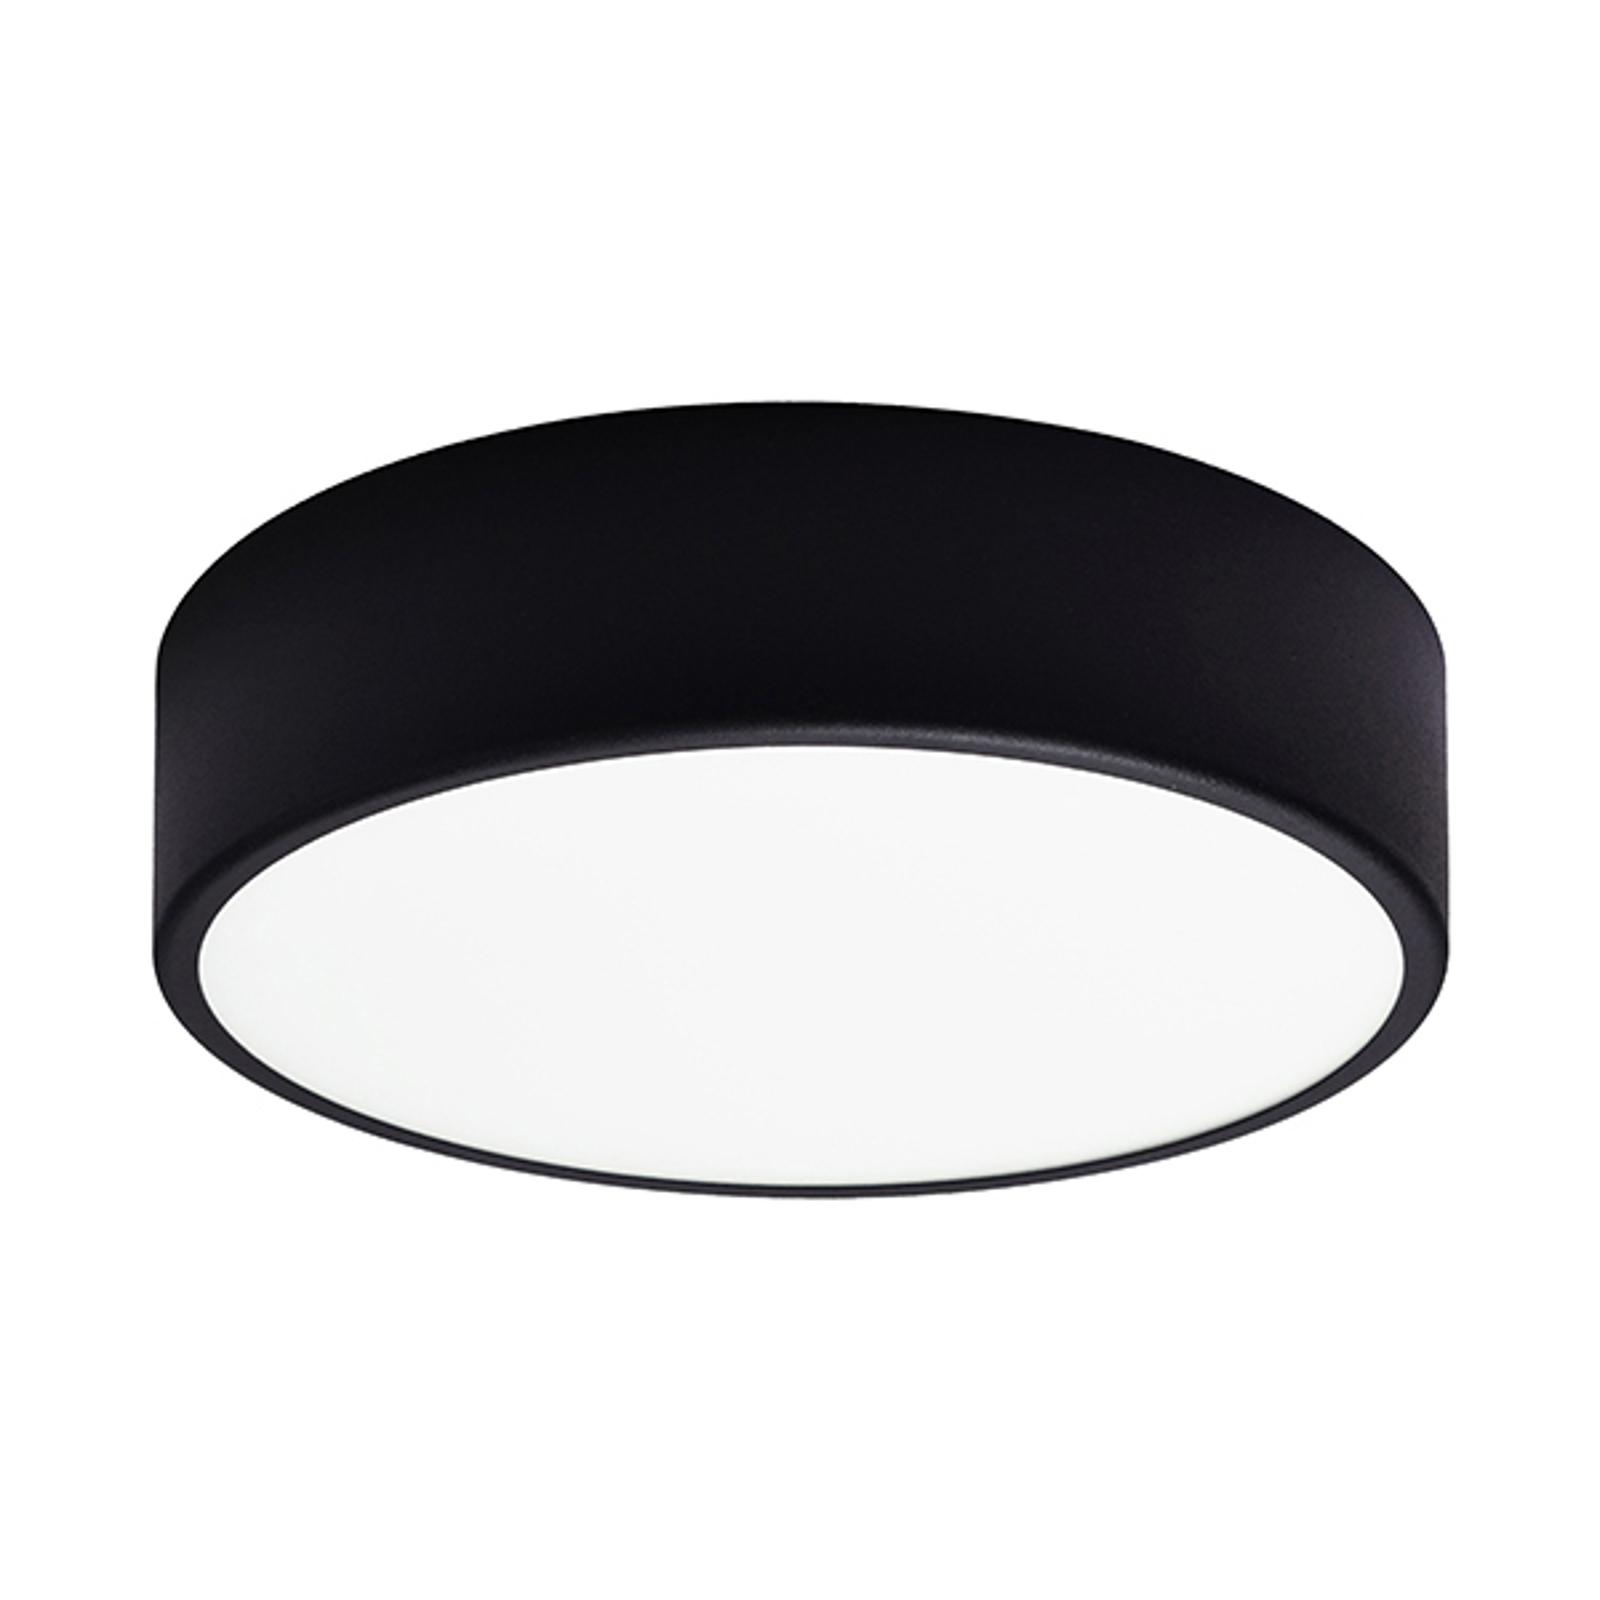 Cleo loftlampe, Ø 30 cm, sort